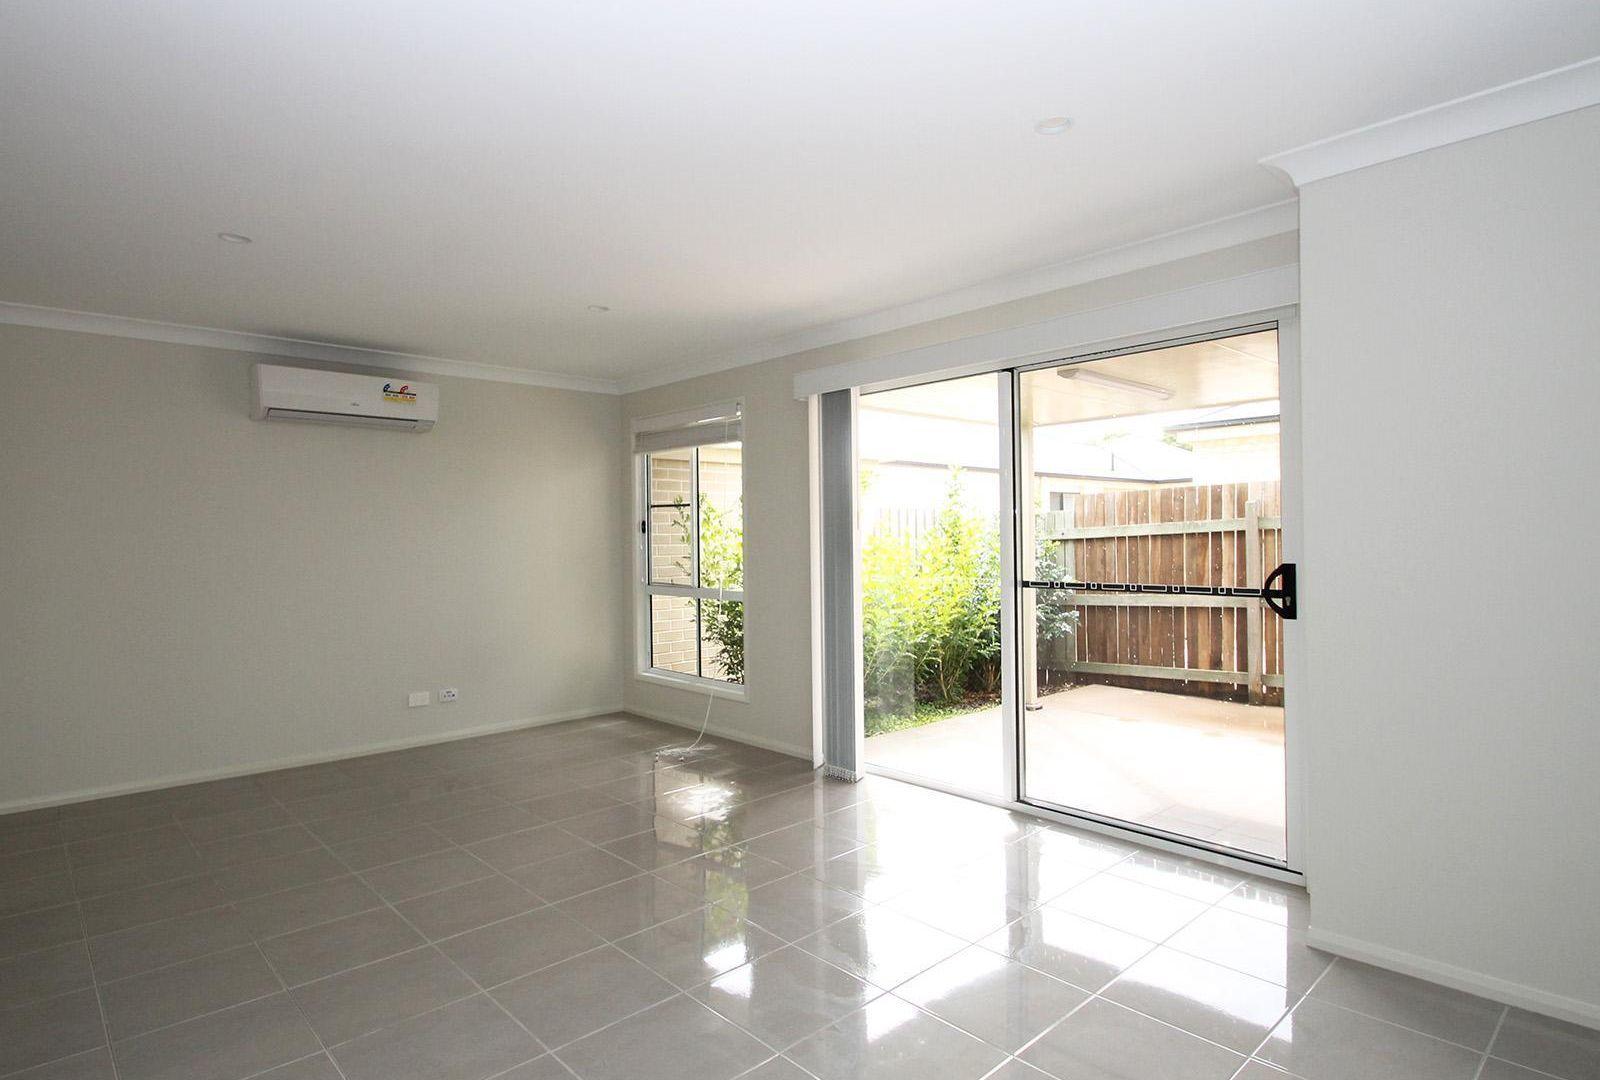 3/12 Horton Street Street, East Toowoomba QLD 4350, Image 1